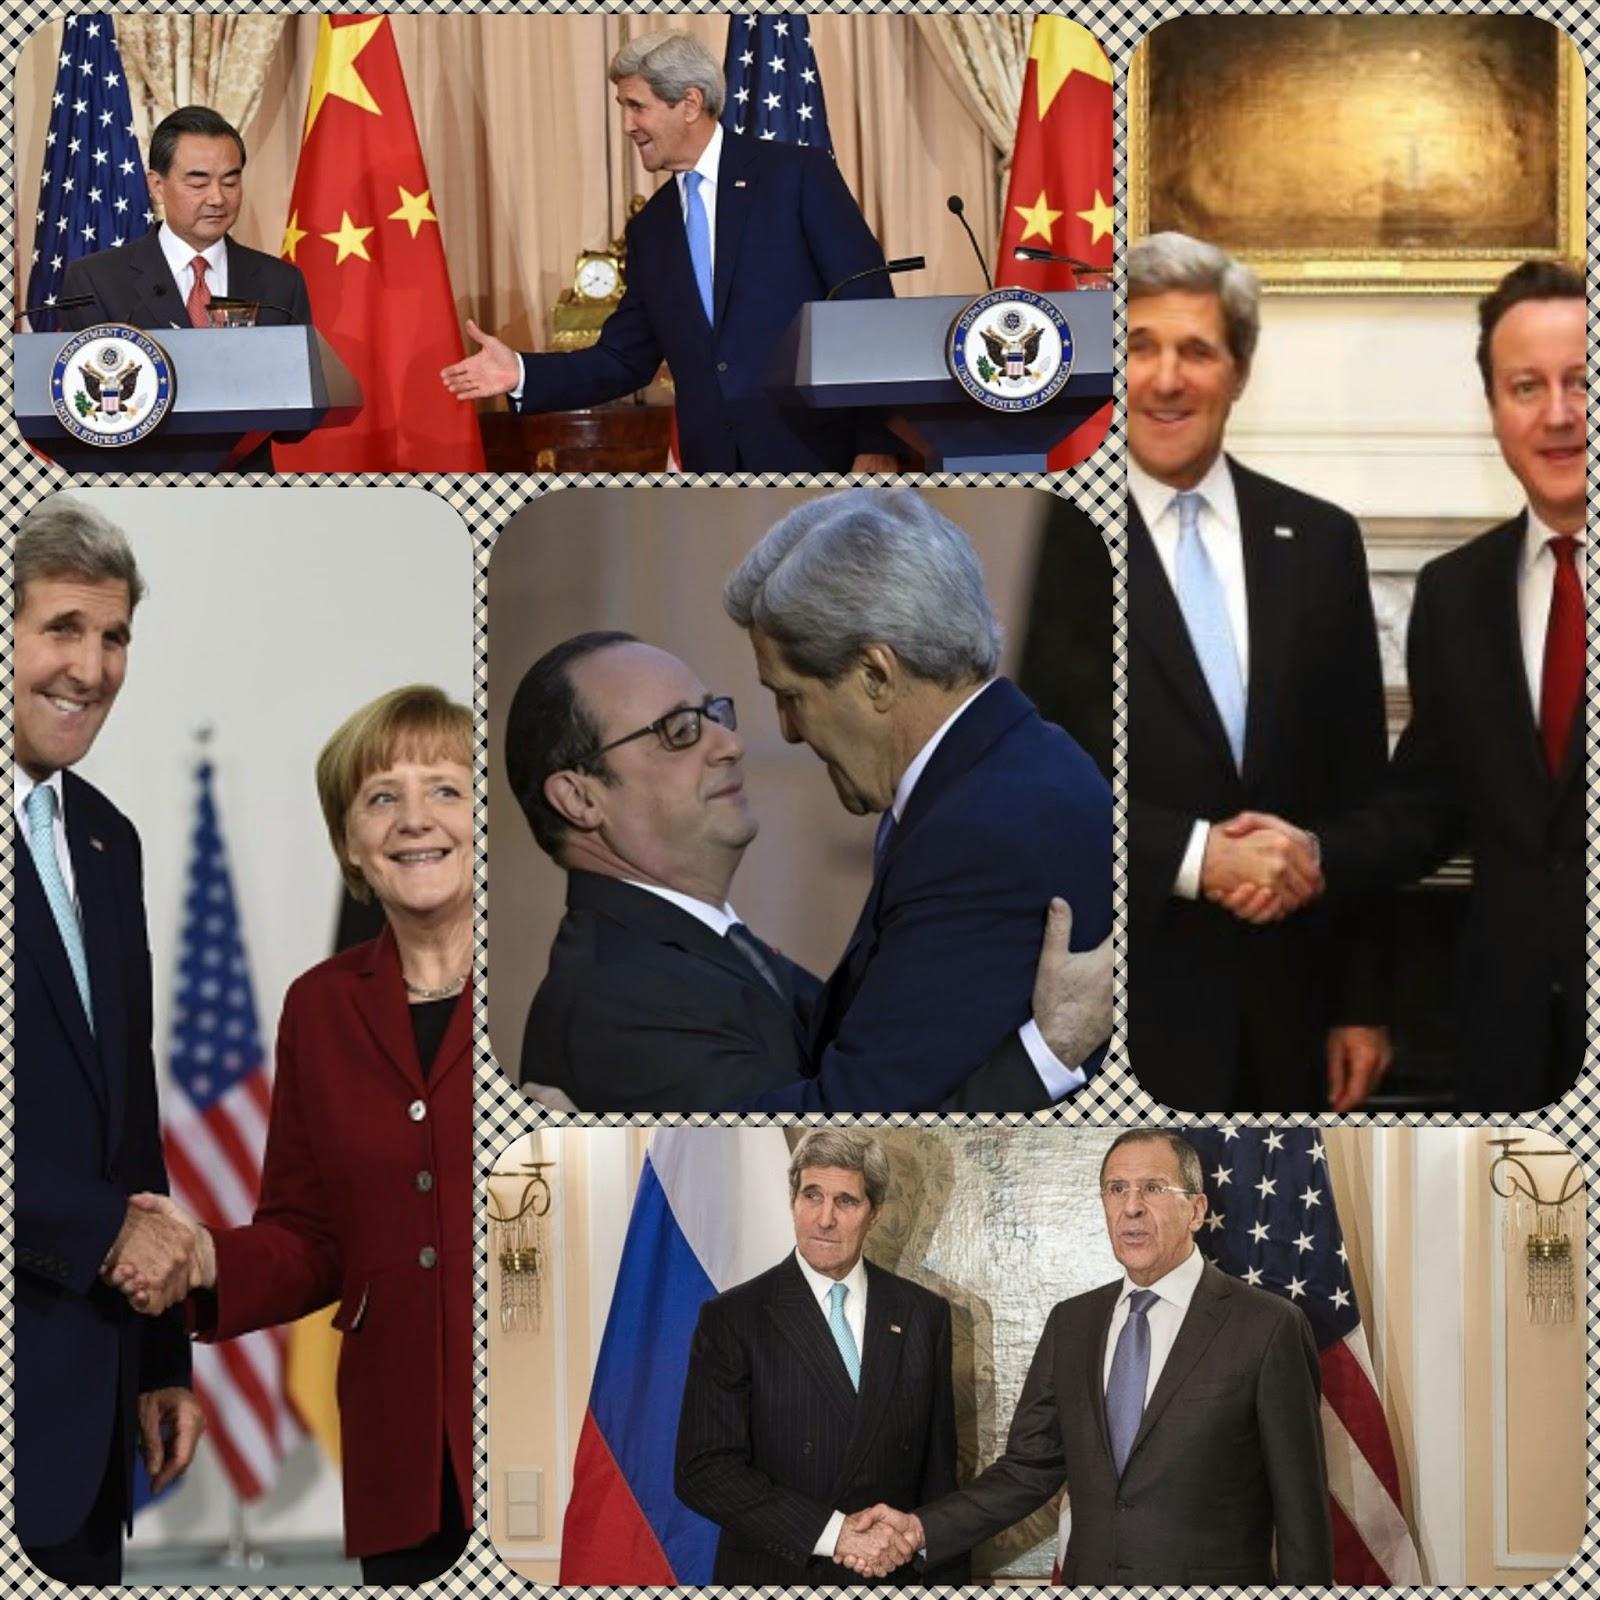 How the world grades John Kerry